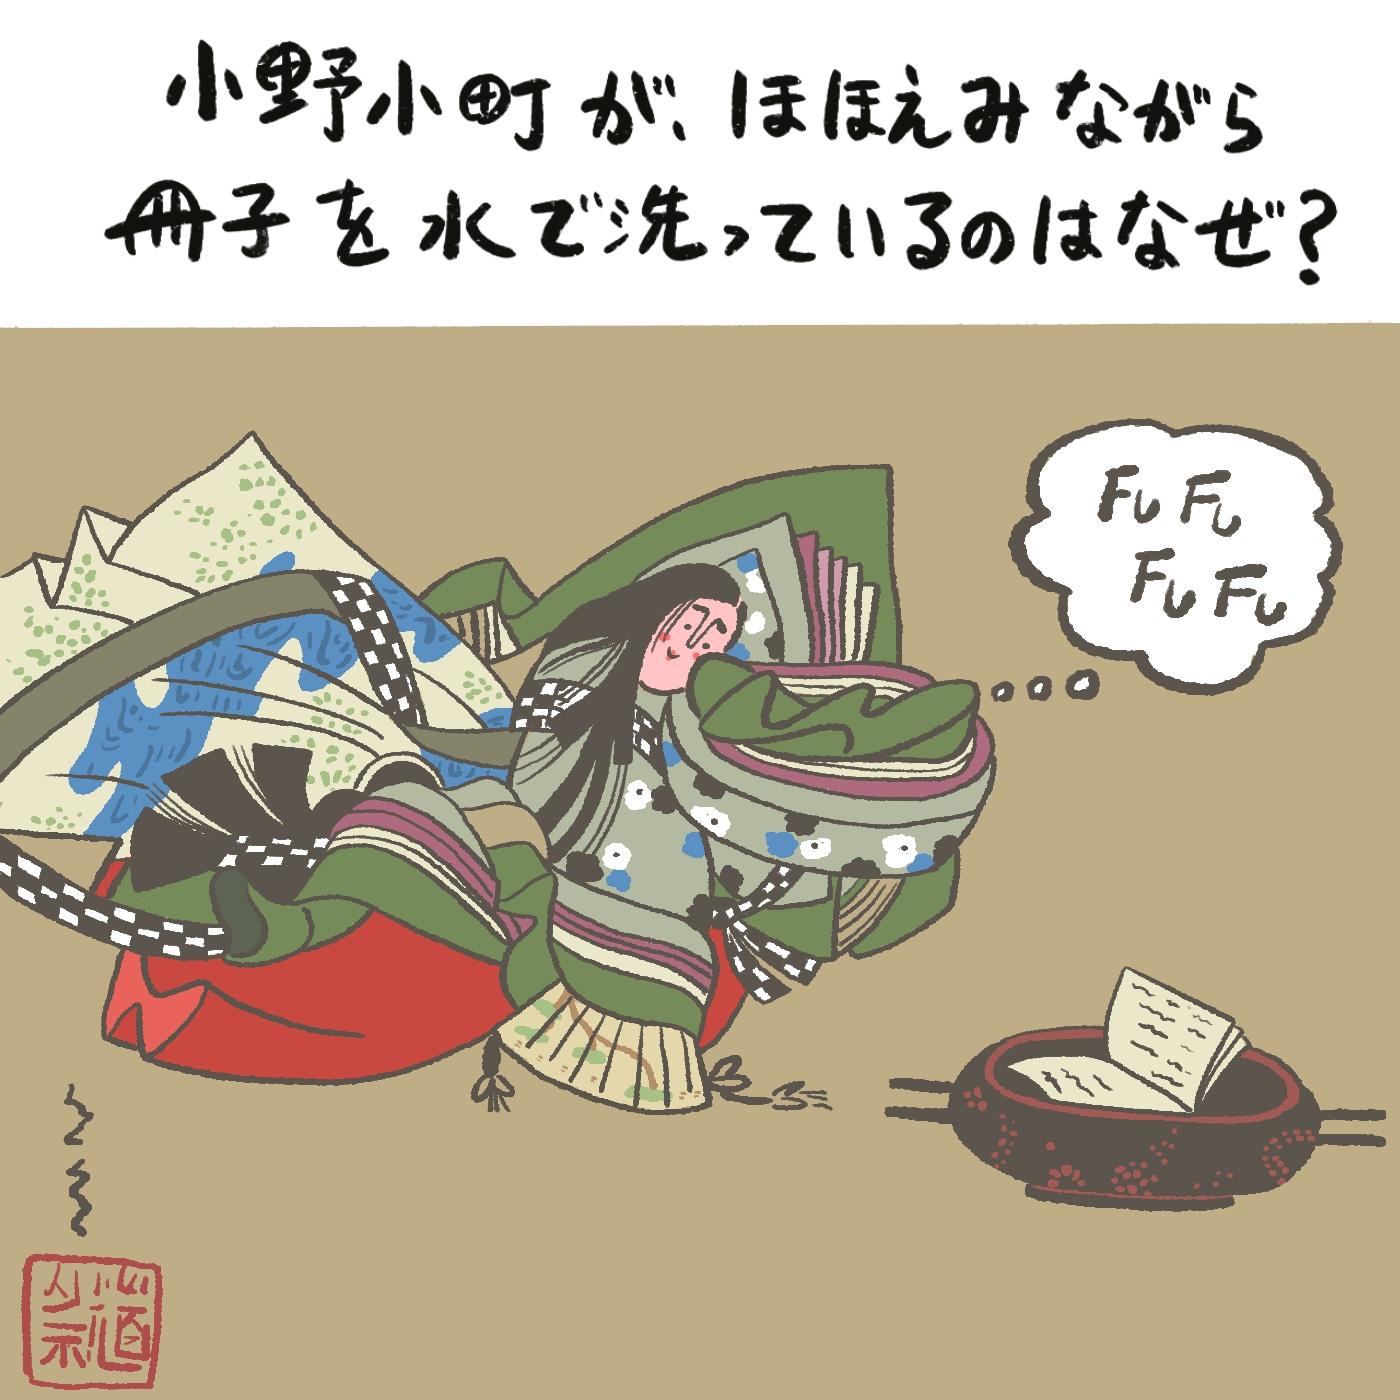 OBIKAKE ナニソレ 小野小町 静嘉堂文庫美術館 江戸のエナジー展